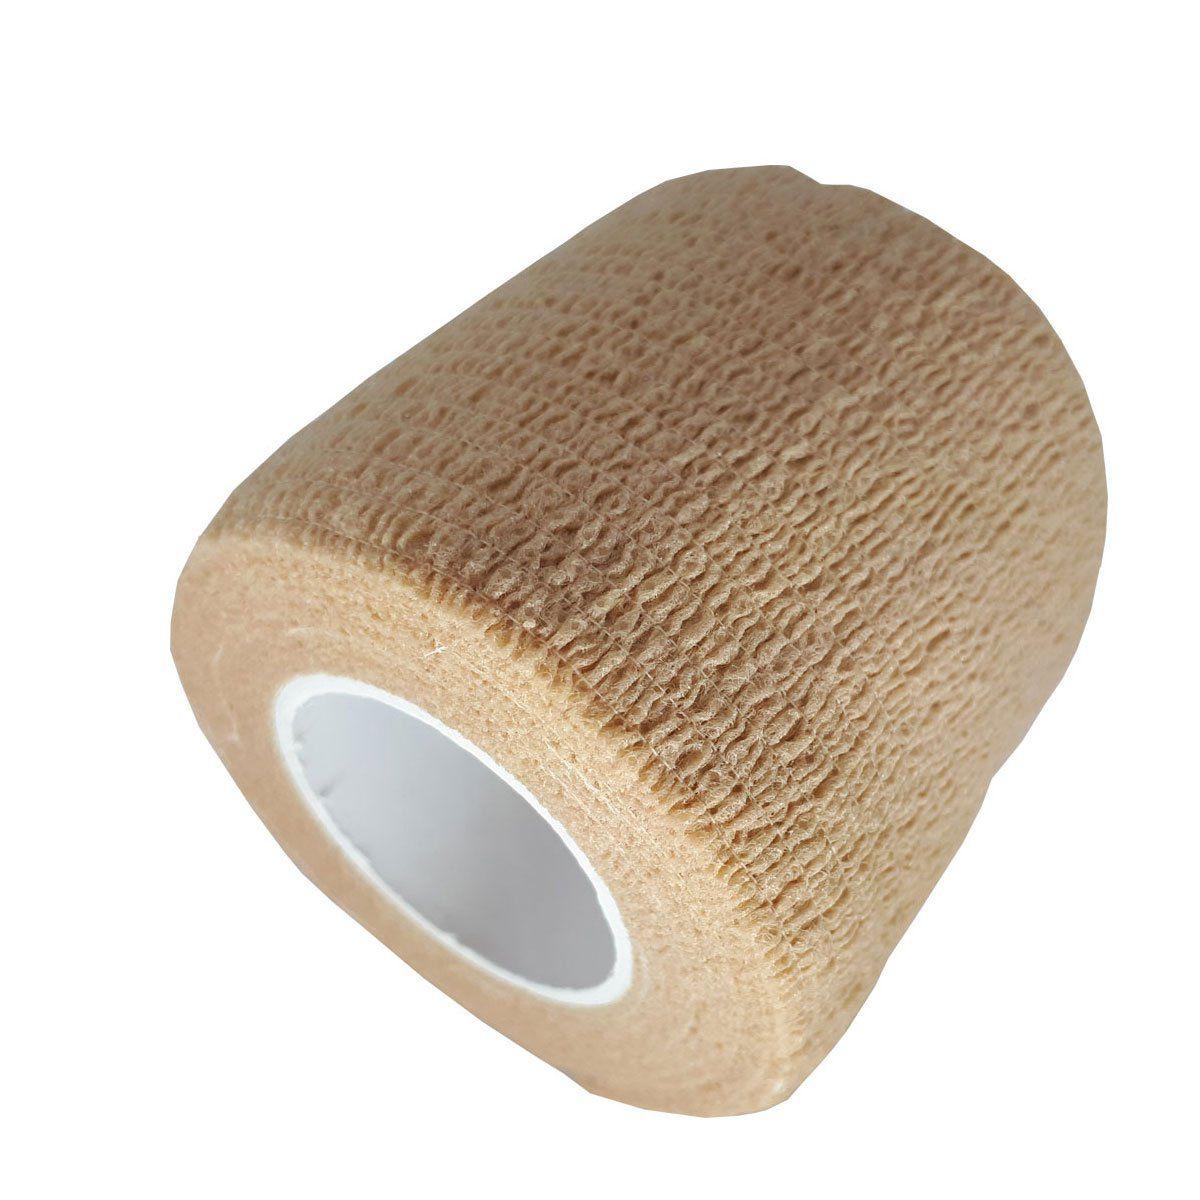 Fita para Camuflagem Albatroz Camo Tape FT-BEIGE 5 Mts Bege